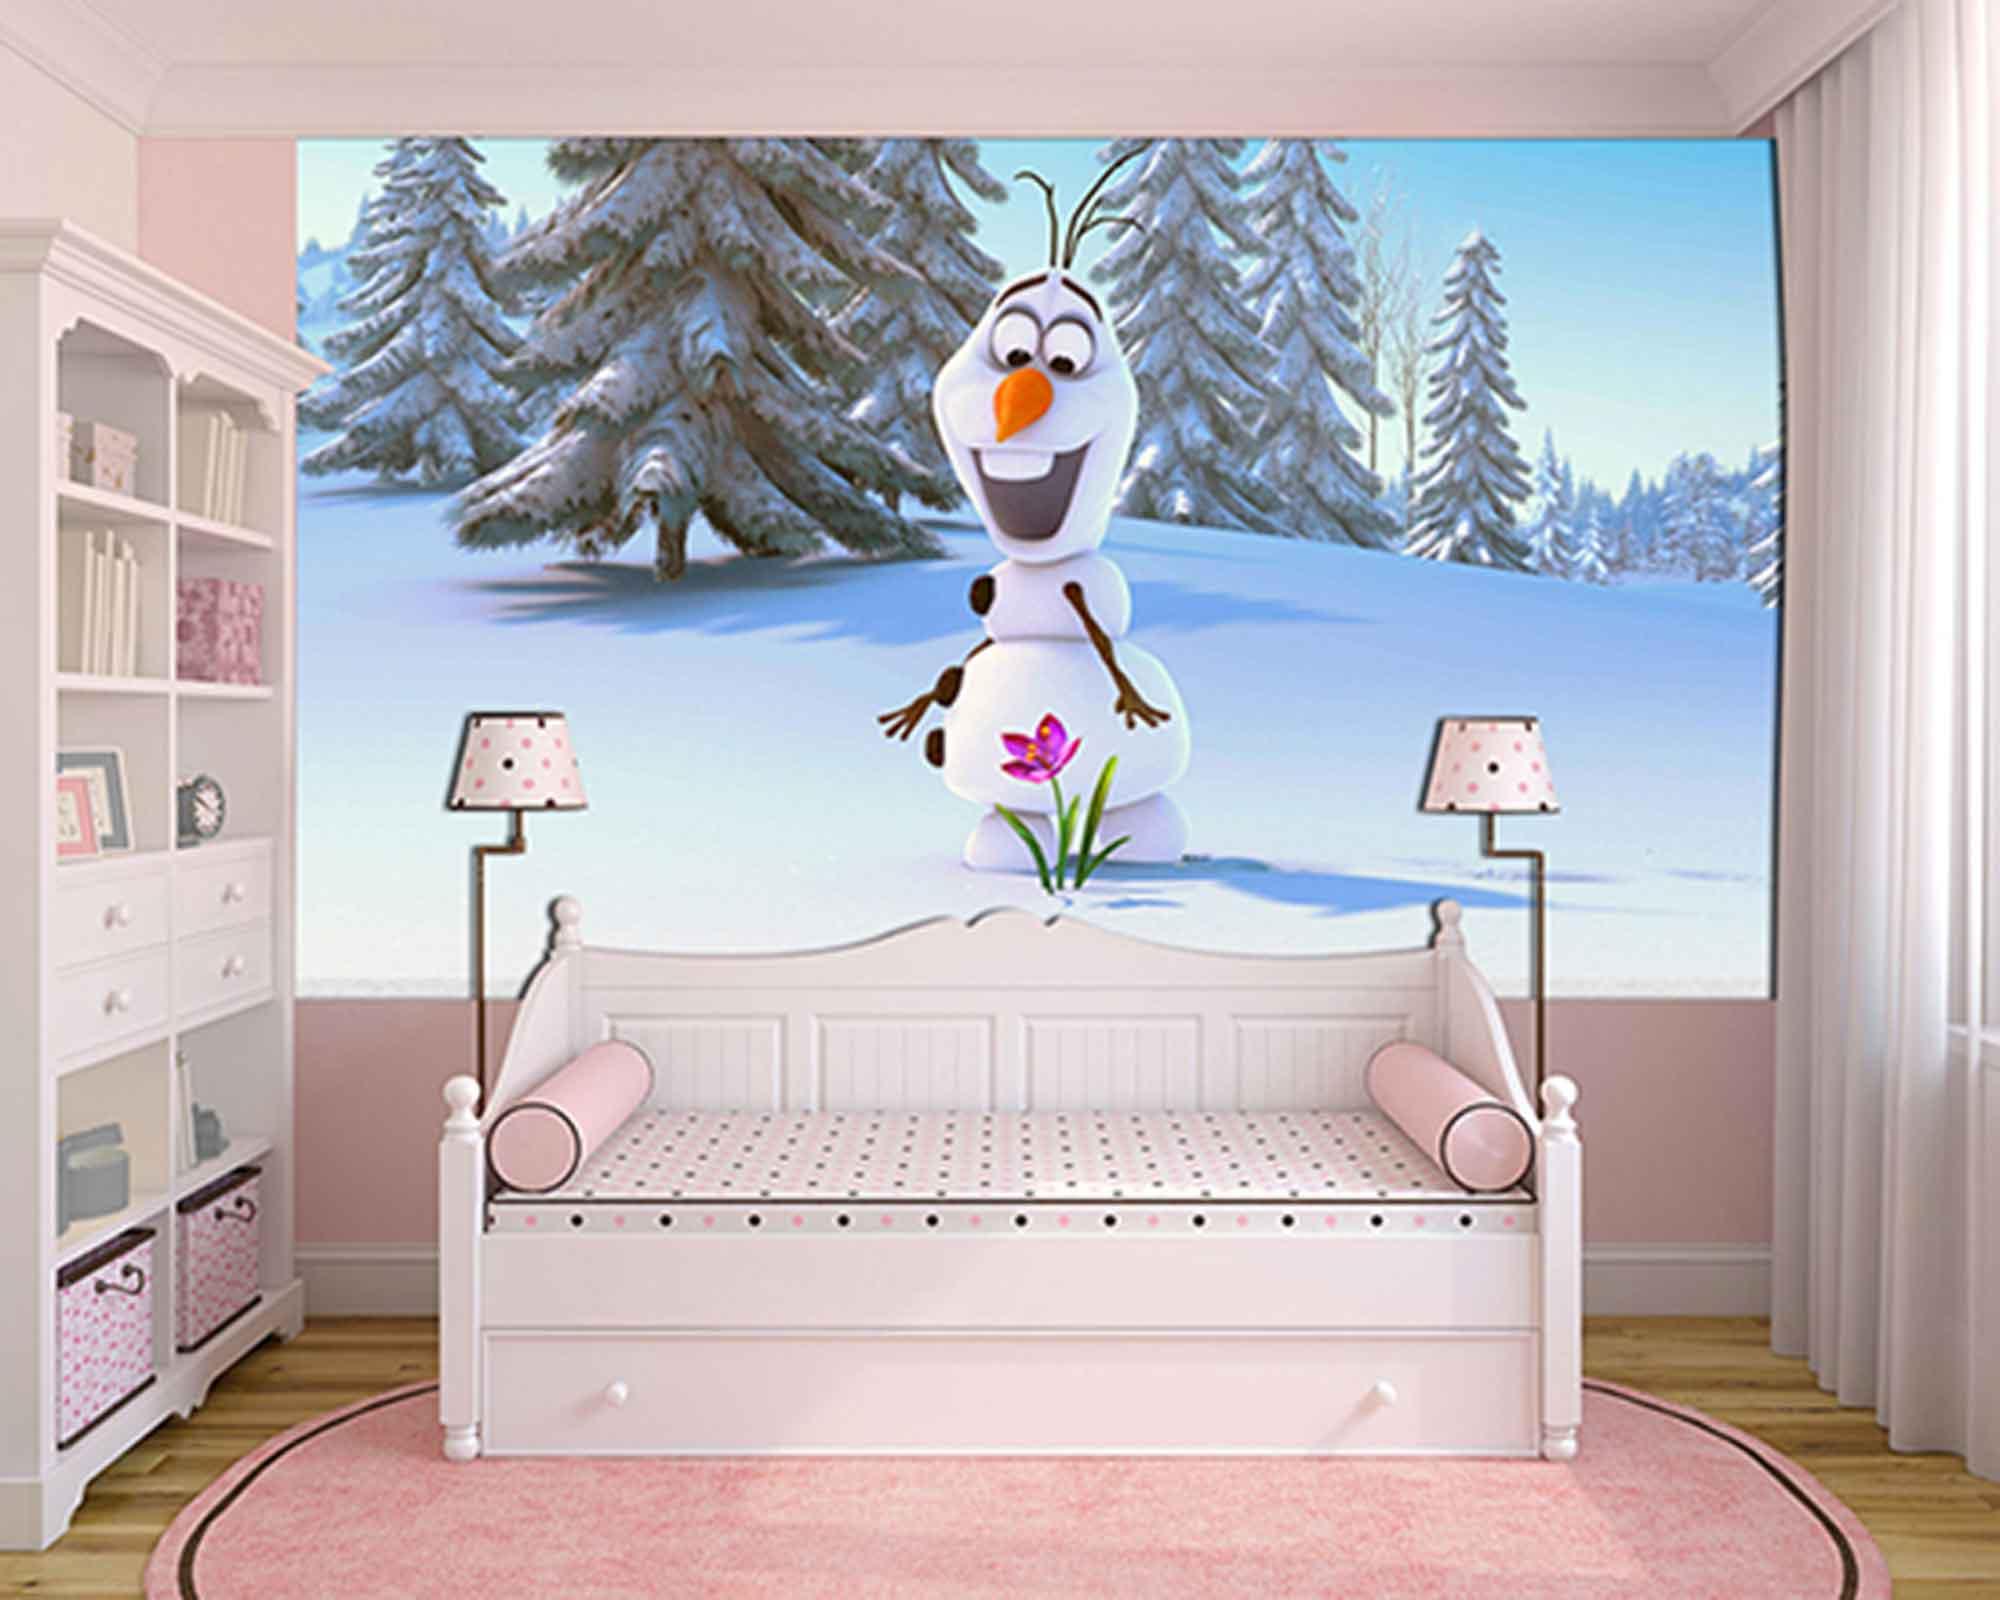 Papel de Parede Infantil Frozen 0007 - Papel de Parede para Quarto  - Paredes Decoradas